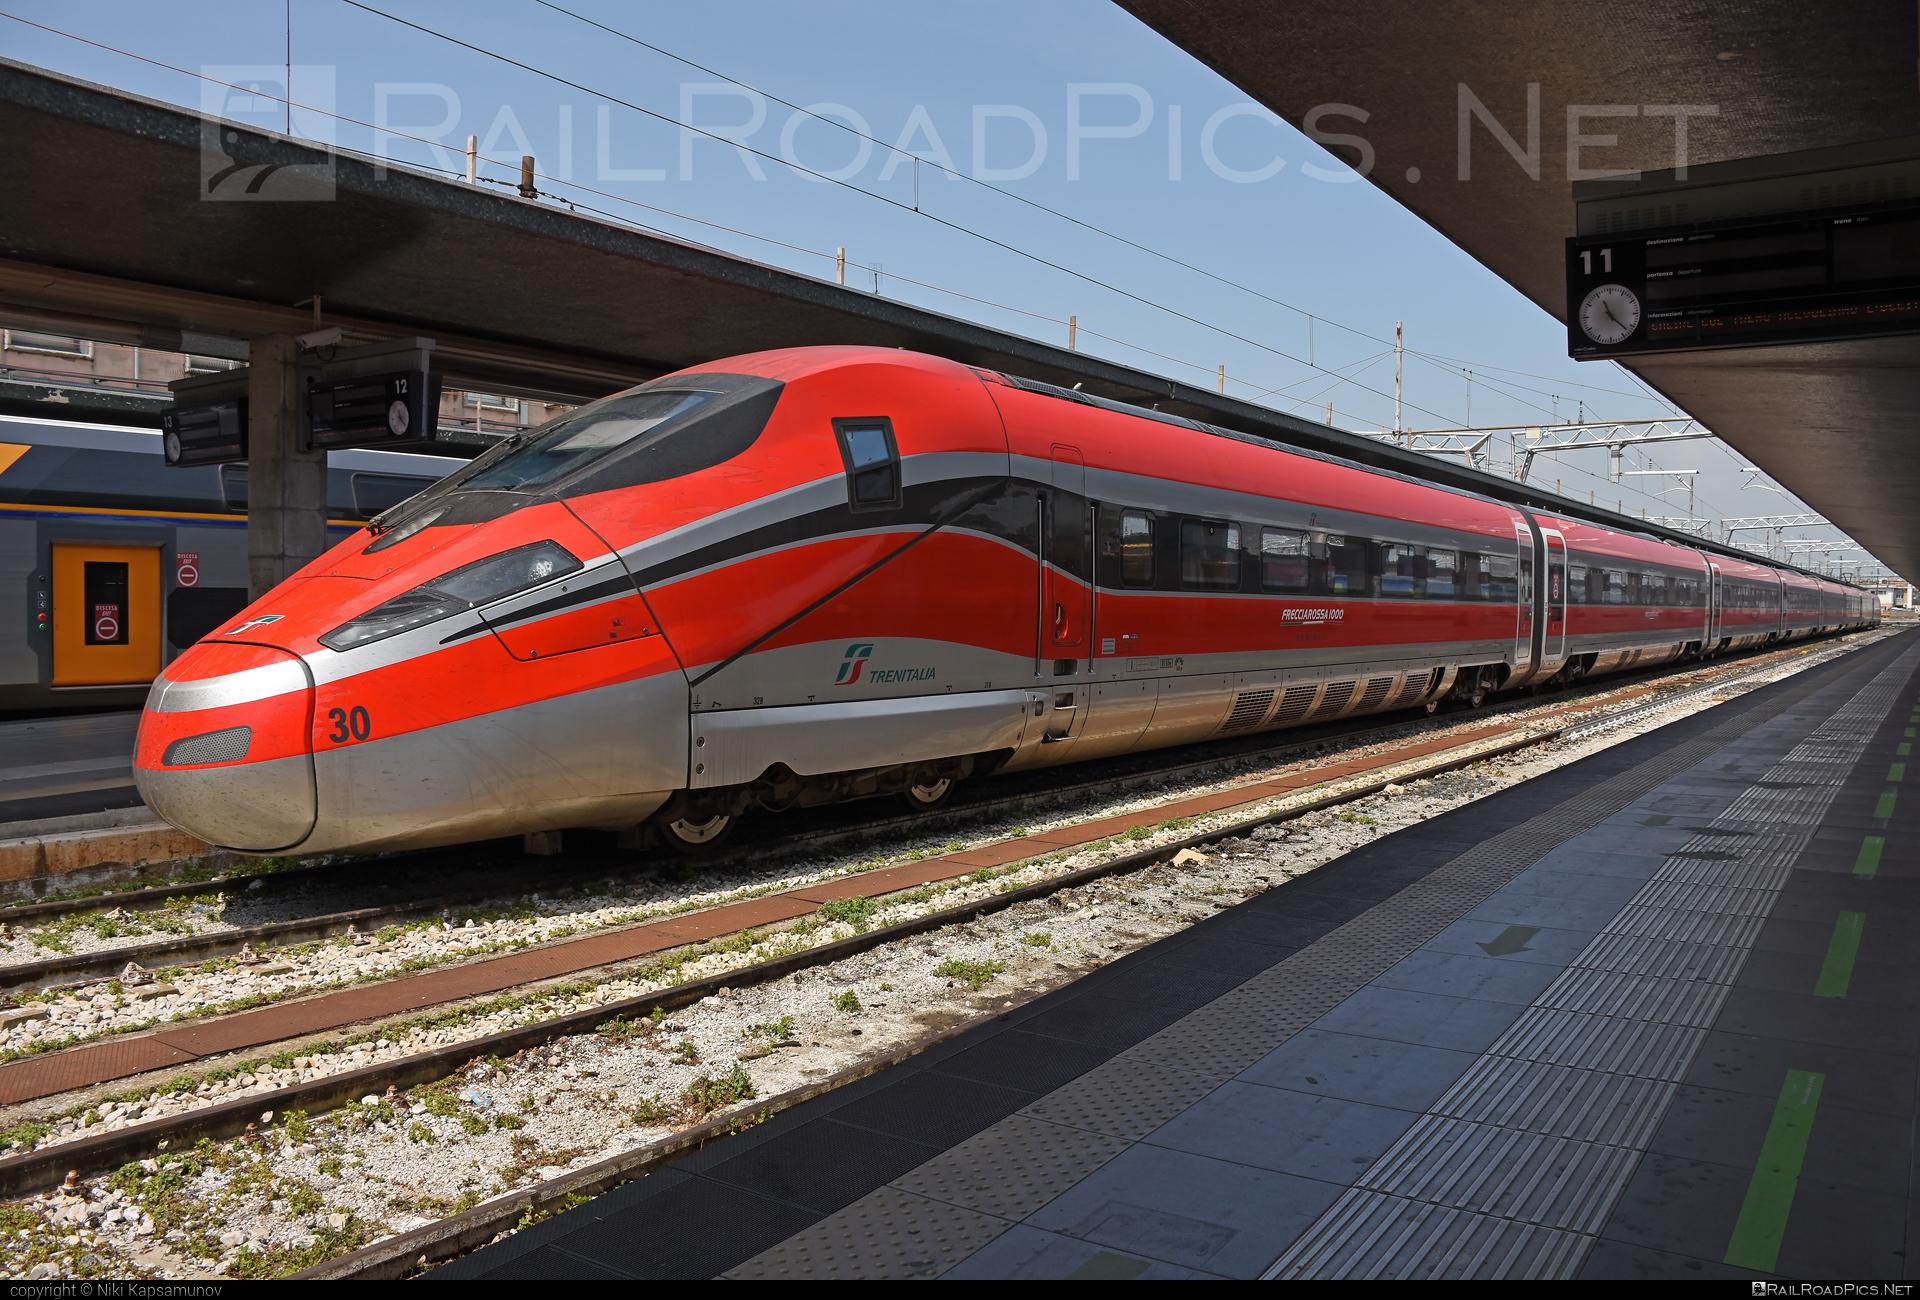 Hitachi Rail Italy / Bombardier ETR.1000 - 400 830-6 operated by Trenitalia S.p.A. #Frecciarossa1000 #HitachiBombardier #HitachiRailItaly #bombardier #etr1000 #ferroviedellostato #frecciarossa #frecciarossa1000 #fs #fsitaliane #trenitalia #trenitaliaspa #v300 #v300zefiro #zefiro